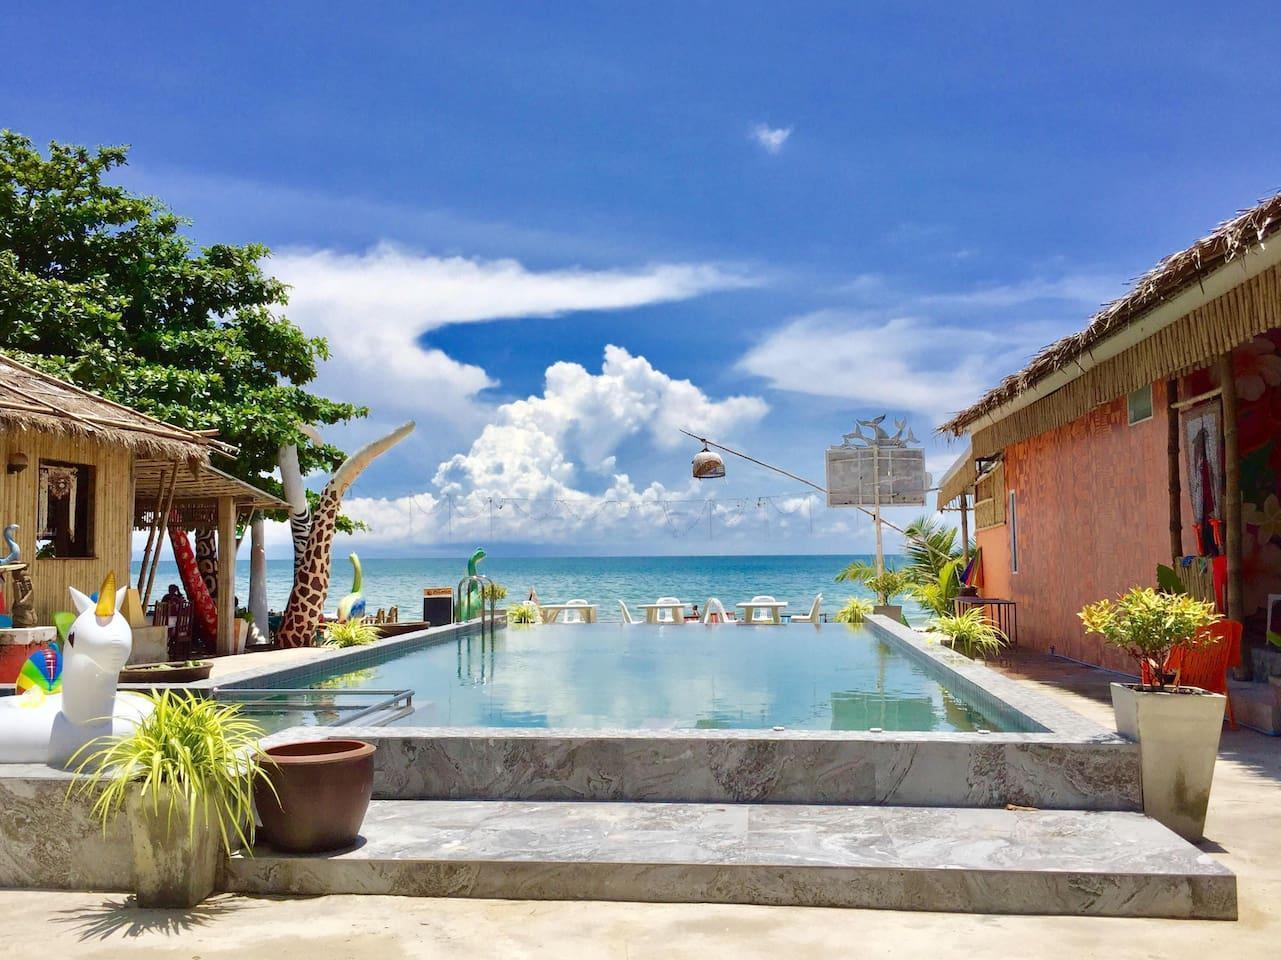 Cha-ba Lanta Resort and Bungalows 1 ห้องนอน 1 ห้องน้ำส่วนตัว ขนาด 40 ตร.ม. – หาดคลองดาว/หาดพระแอ